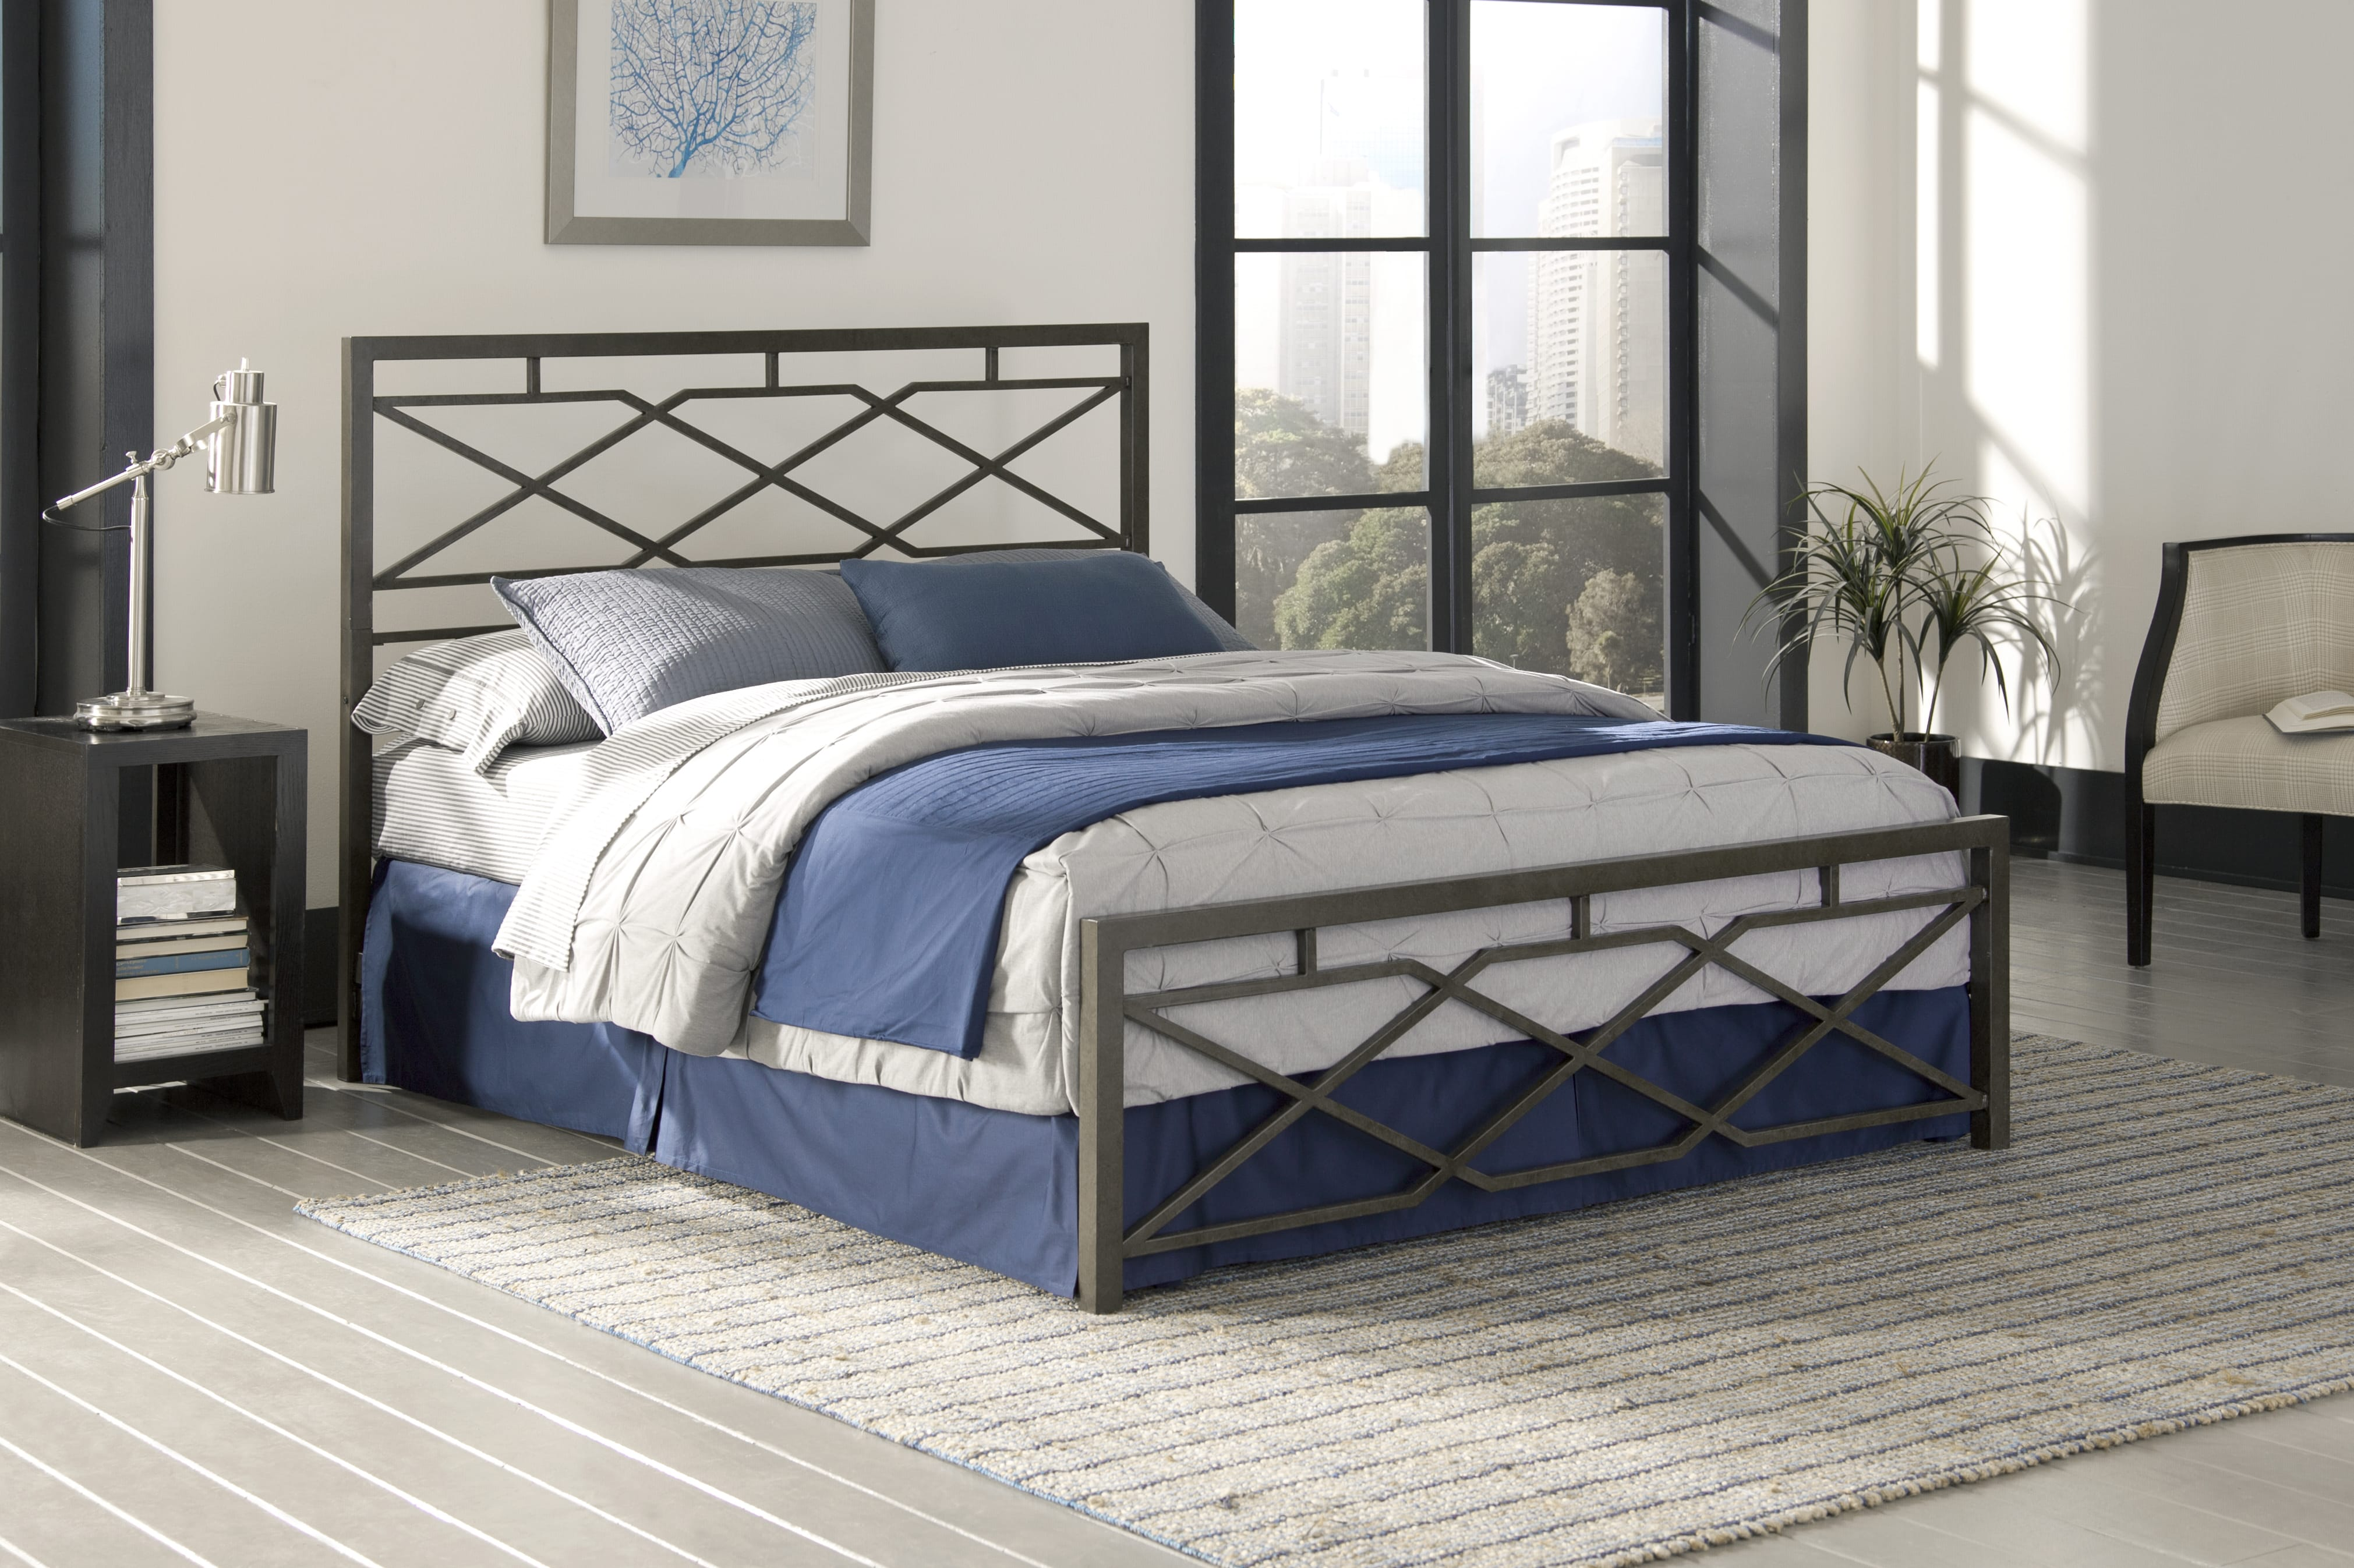 Alpine SNAP™ Bed